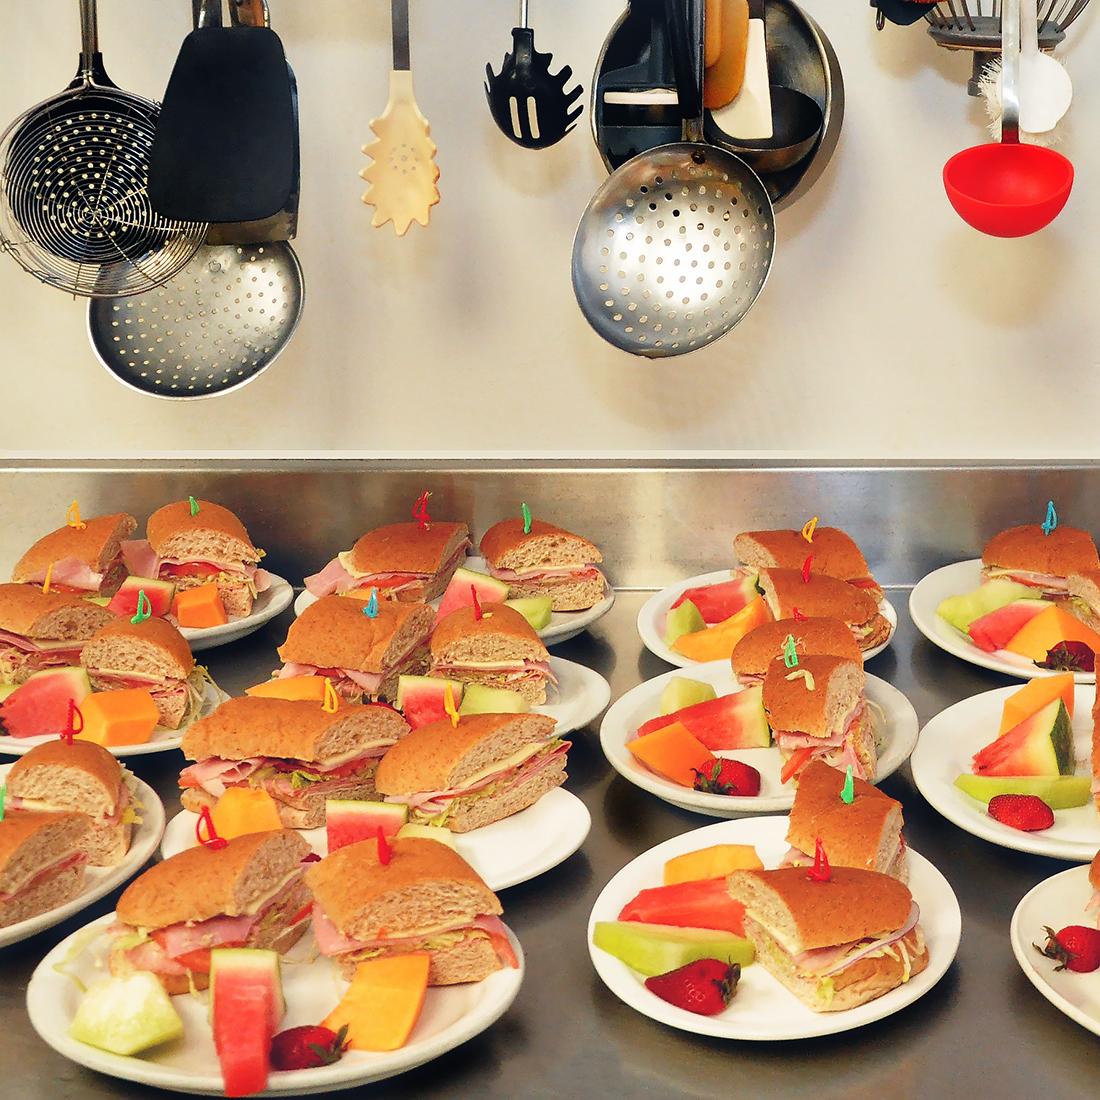 Punanai Centre kitchen